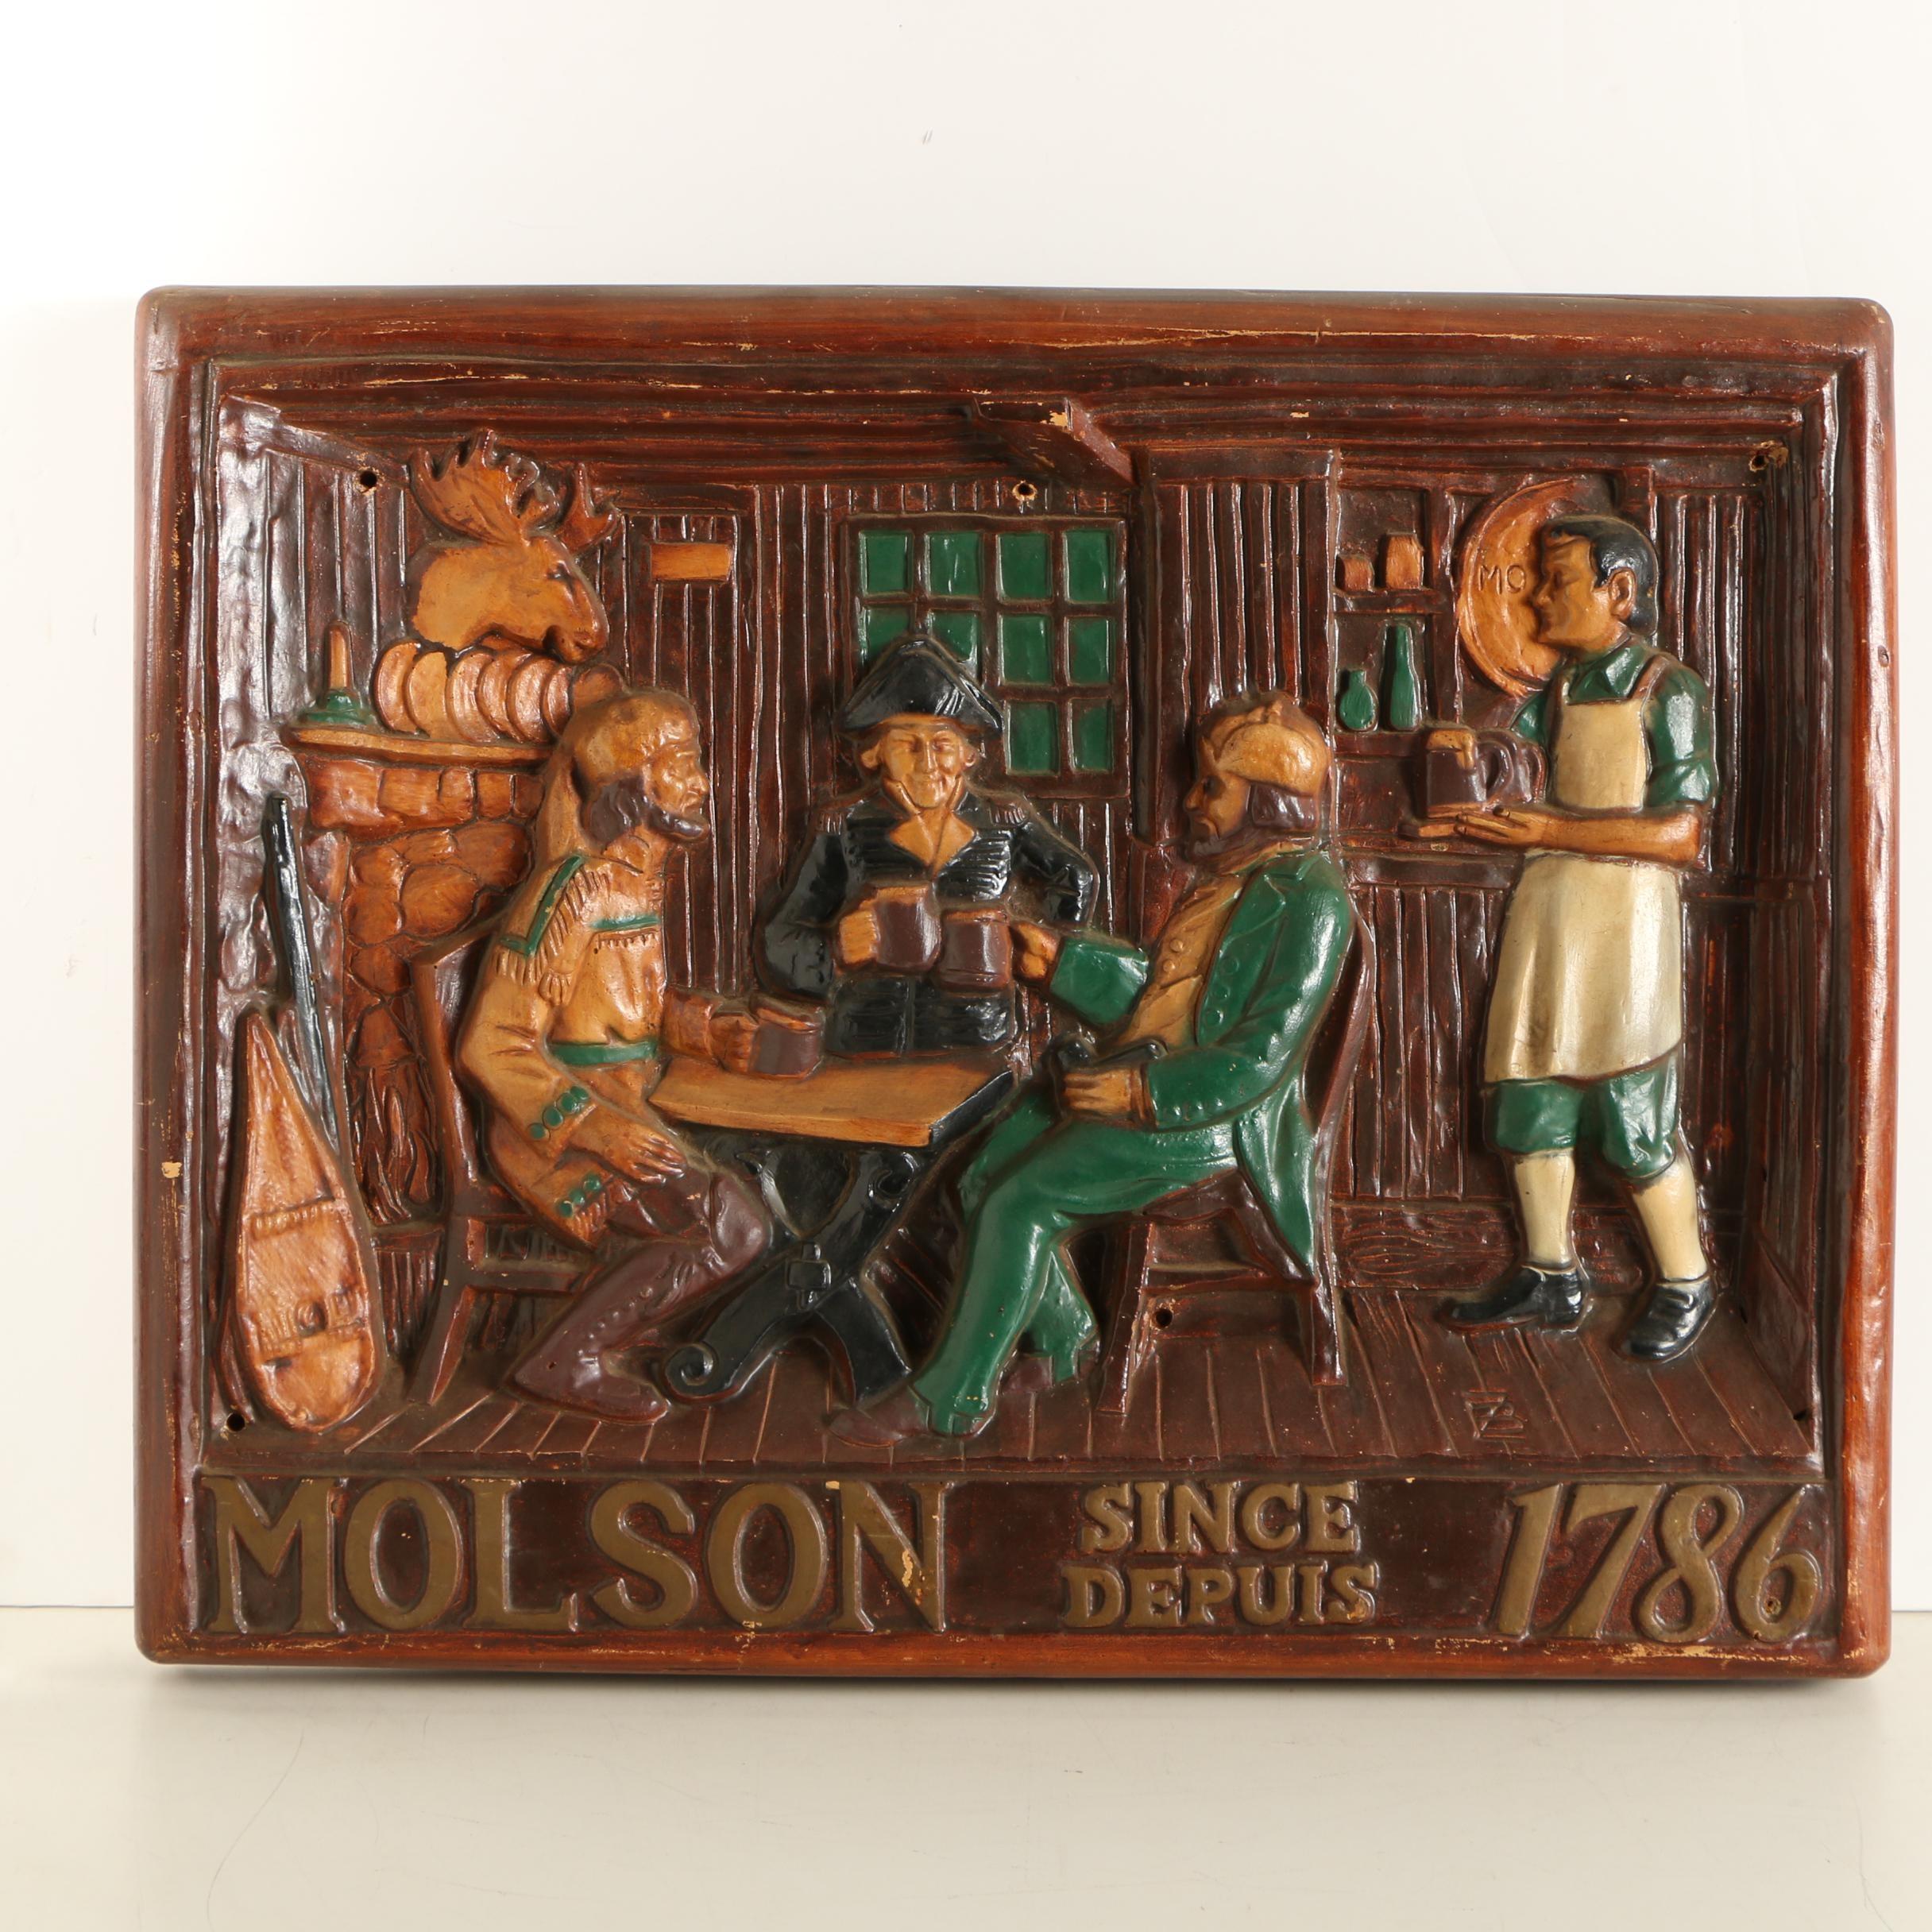 Vintage Wooden Molson Beer Sign